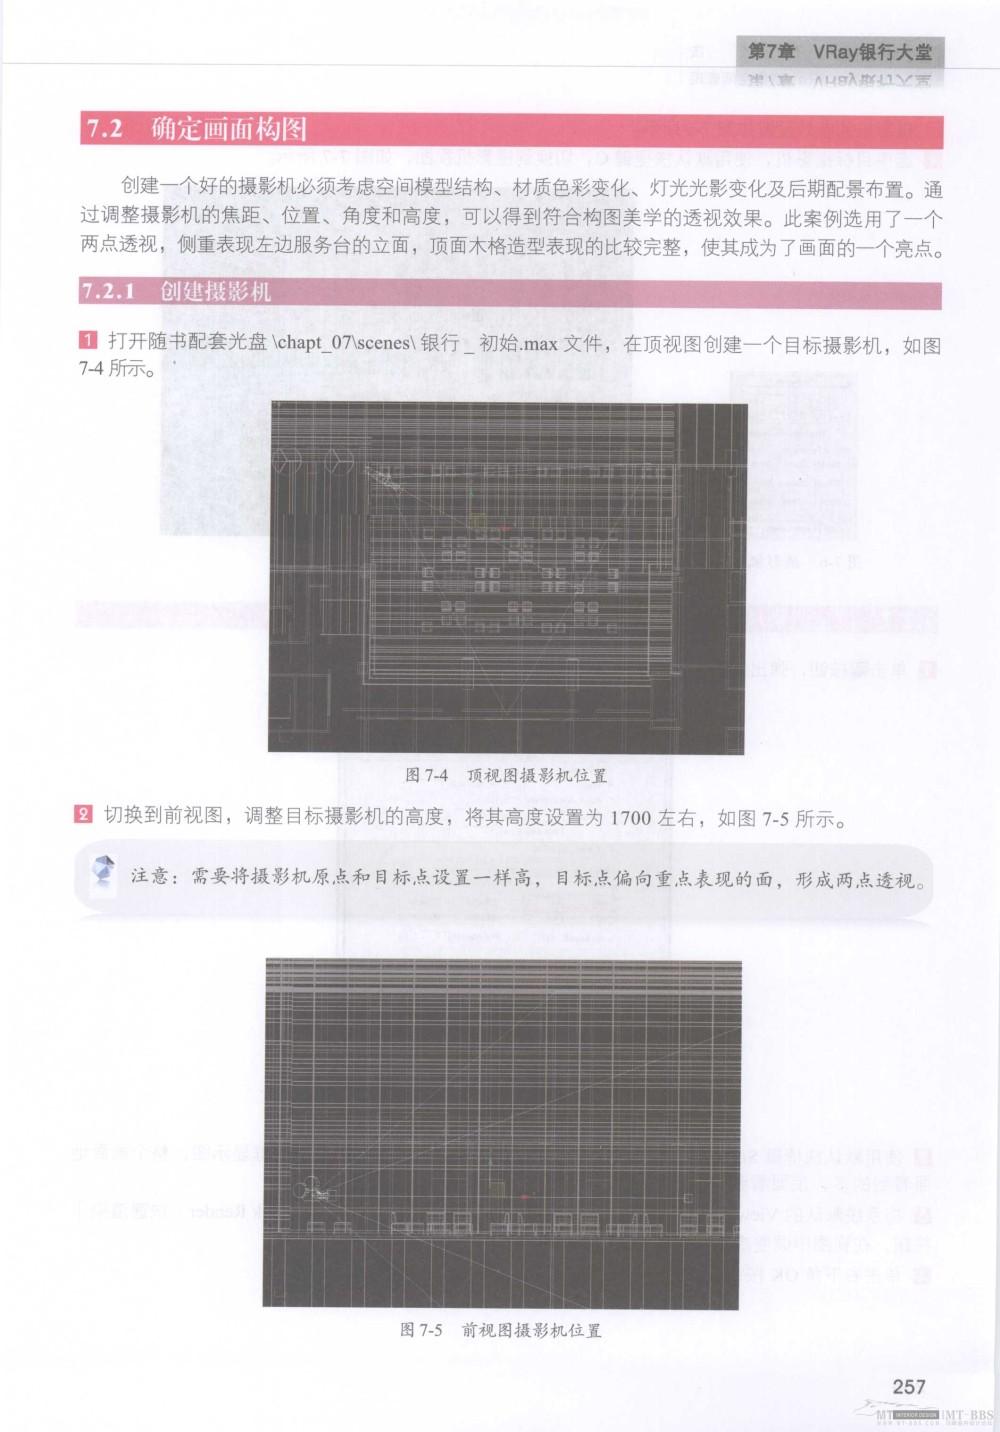 水晶石技法-3ds_Max&VRay室内空间表现_水晶石技法-3ds_Max&VRay室内空间表现_页面_263.jpg